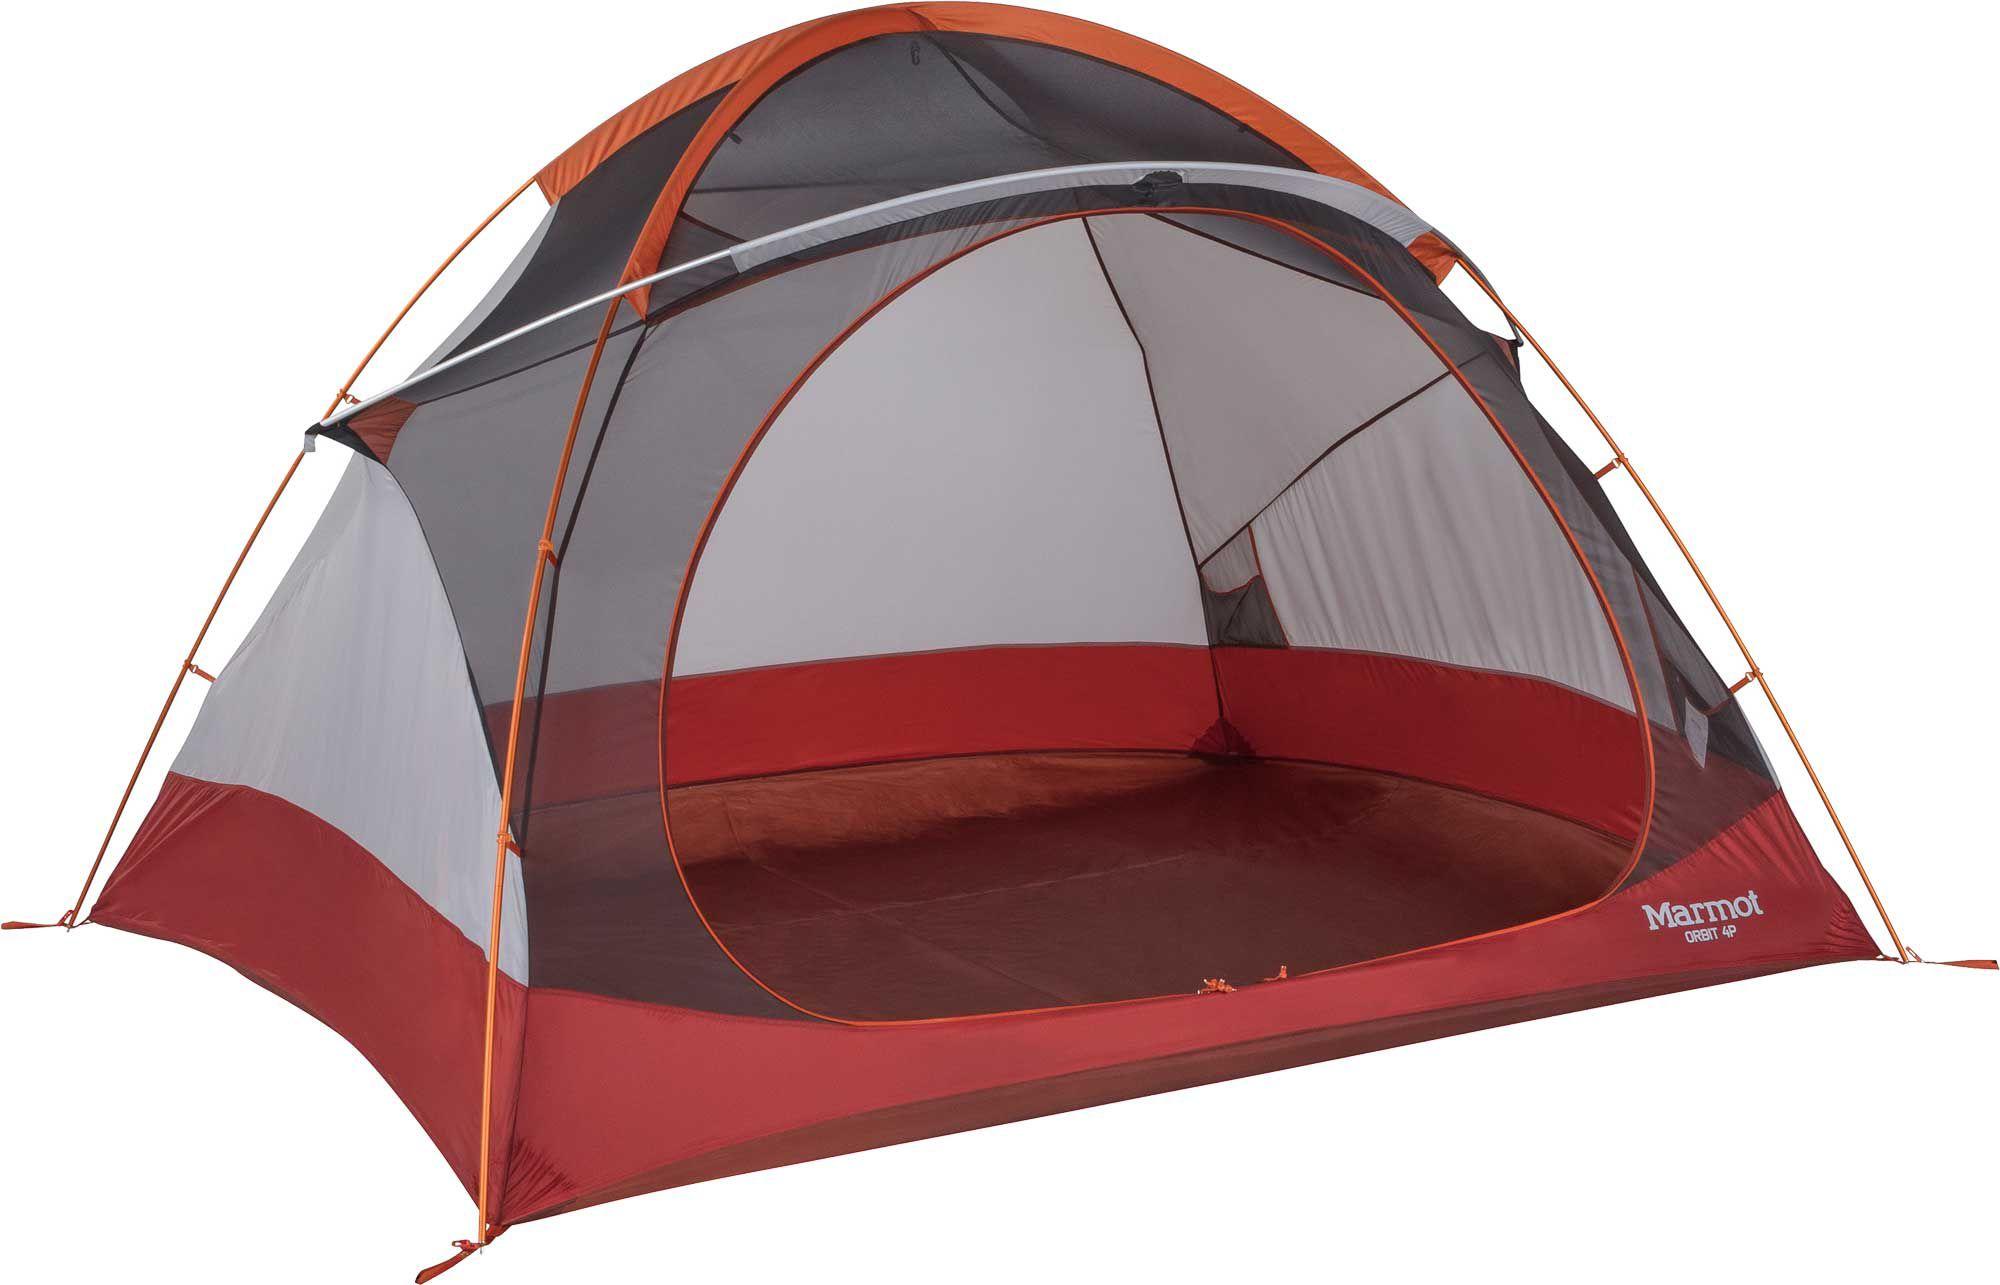 1  sc 1 th 180 & Marmot Orbit 4-Person Tent | DICKu0027S Sporting Goods